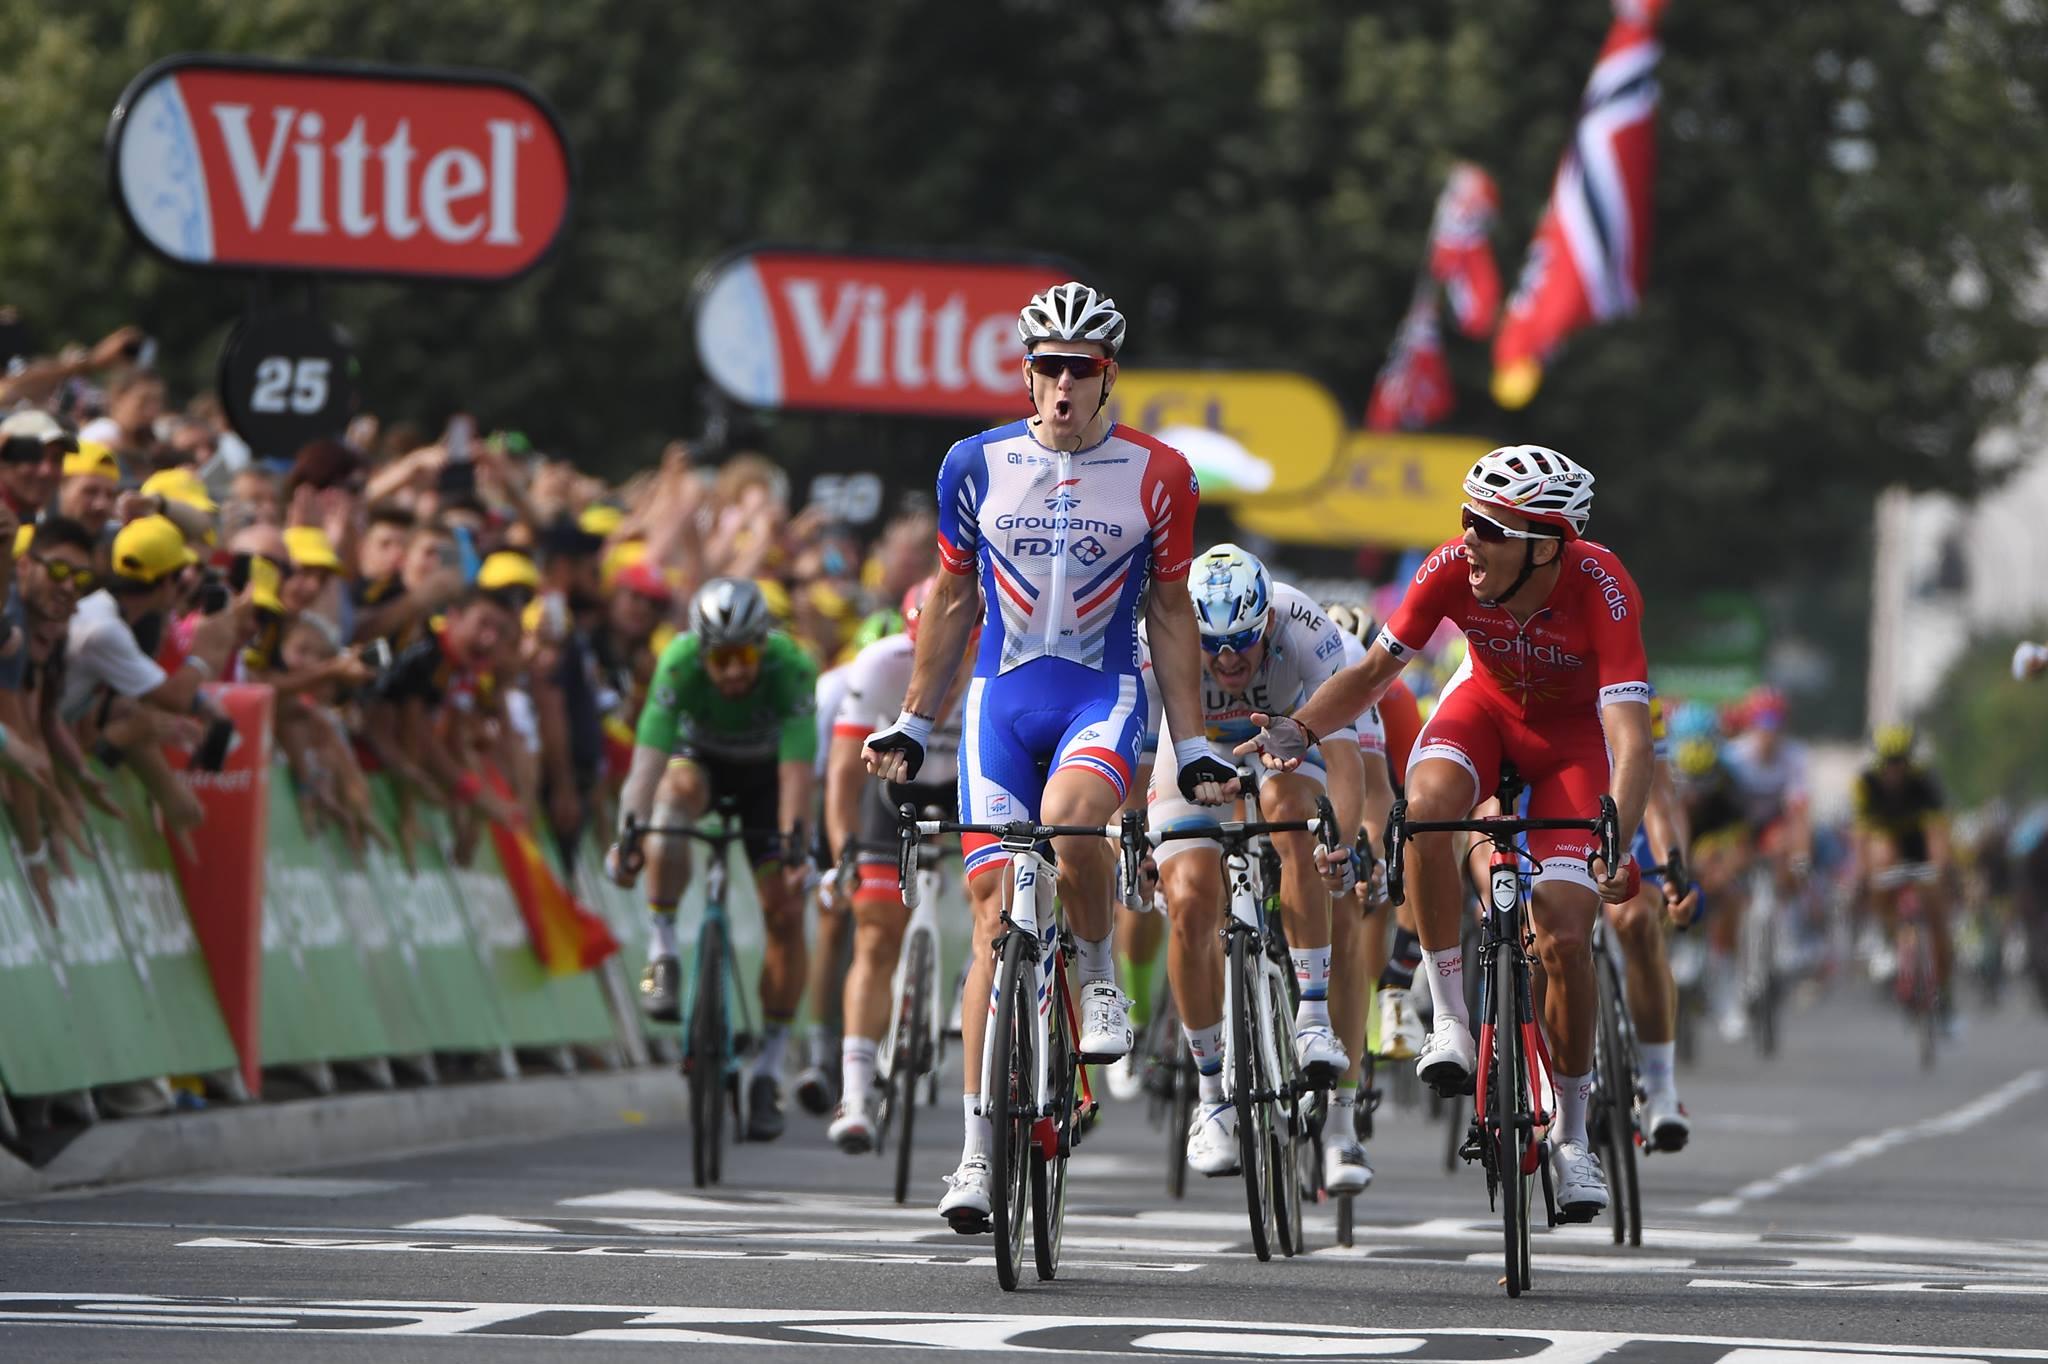 Arnaud Demare vince la diciottesima tappa del Tour de France 2018